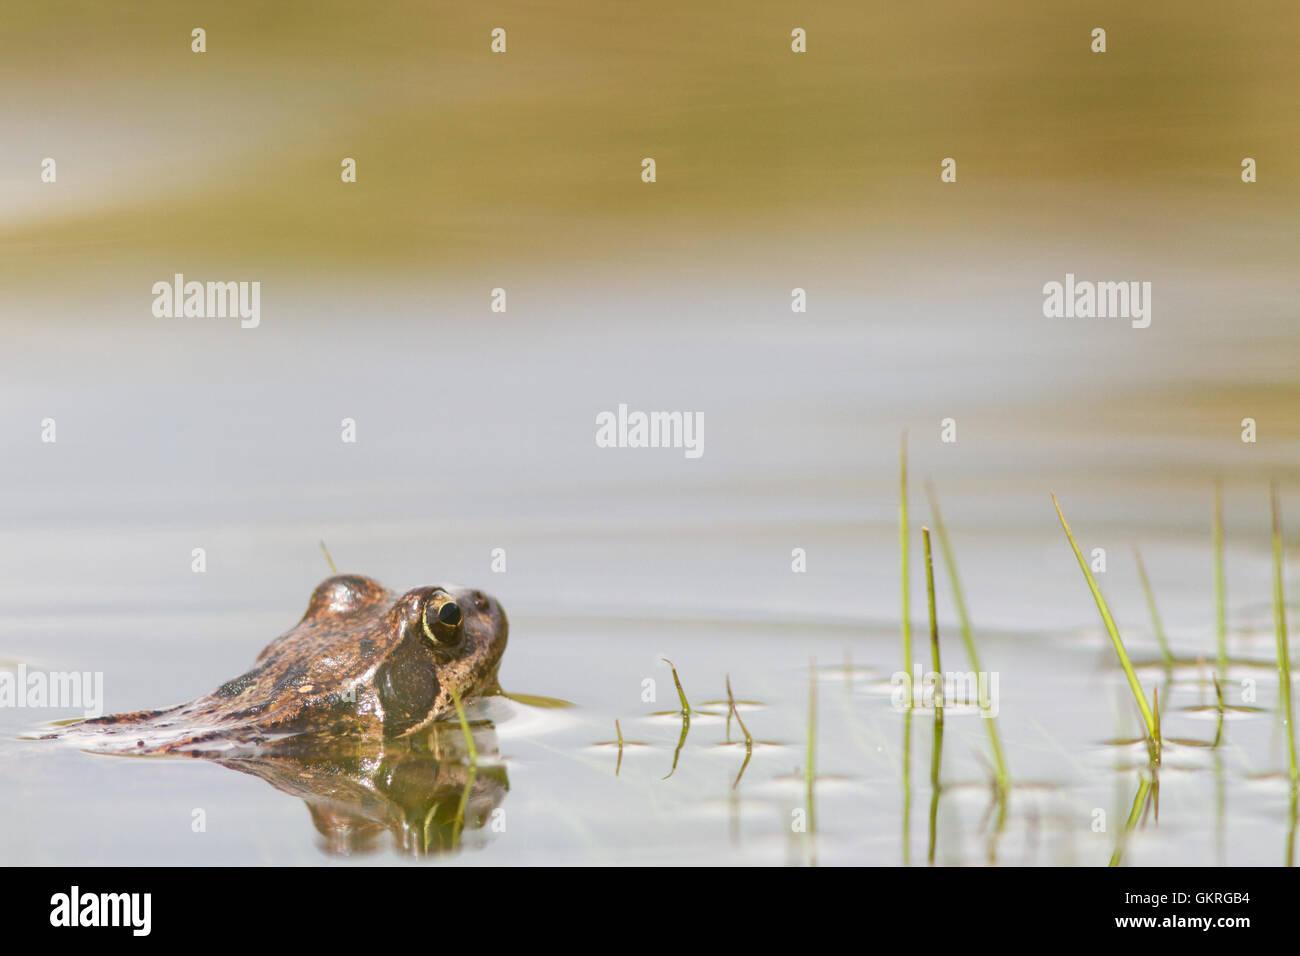 Common frog ( Rana temporaria ) in the water, italian Alps - Stock Image